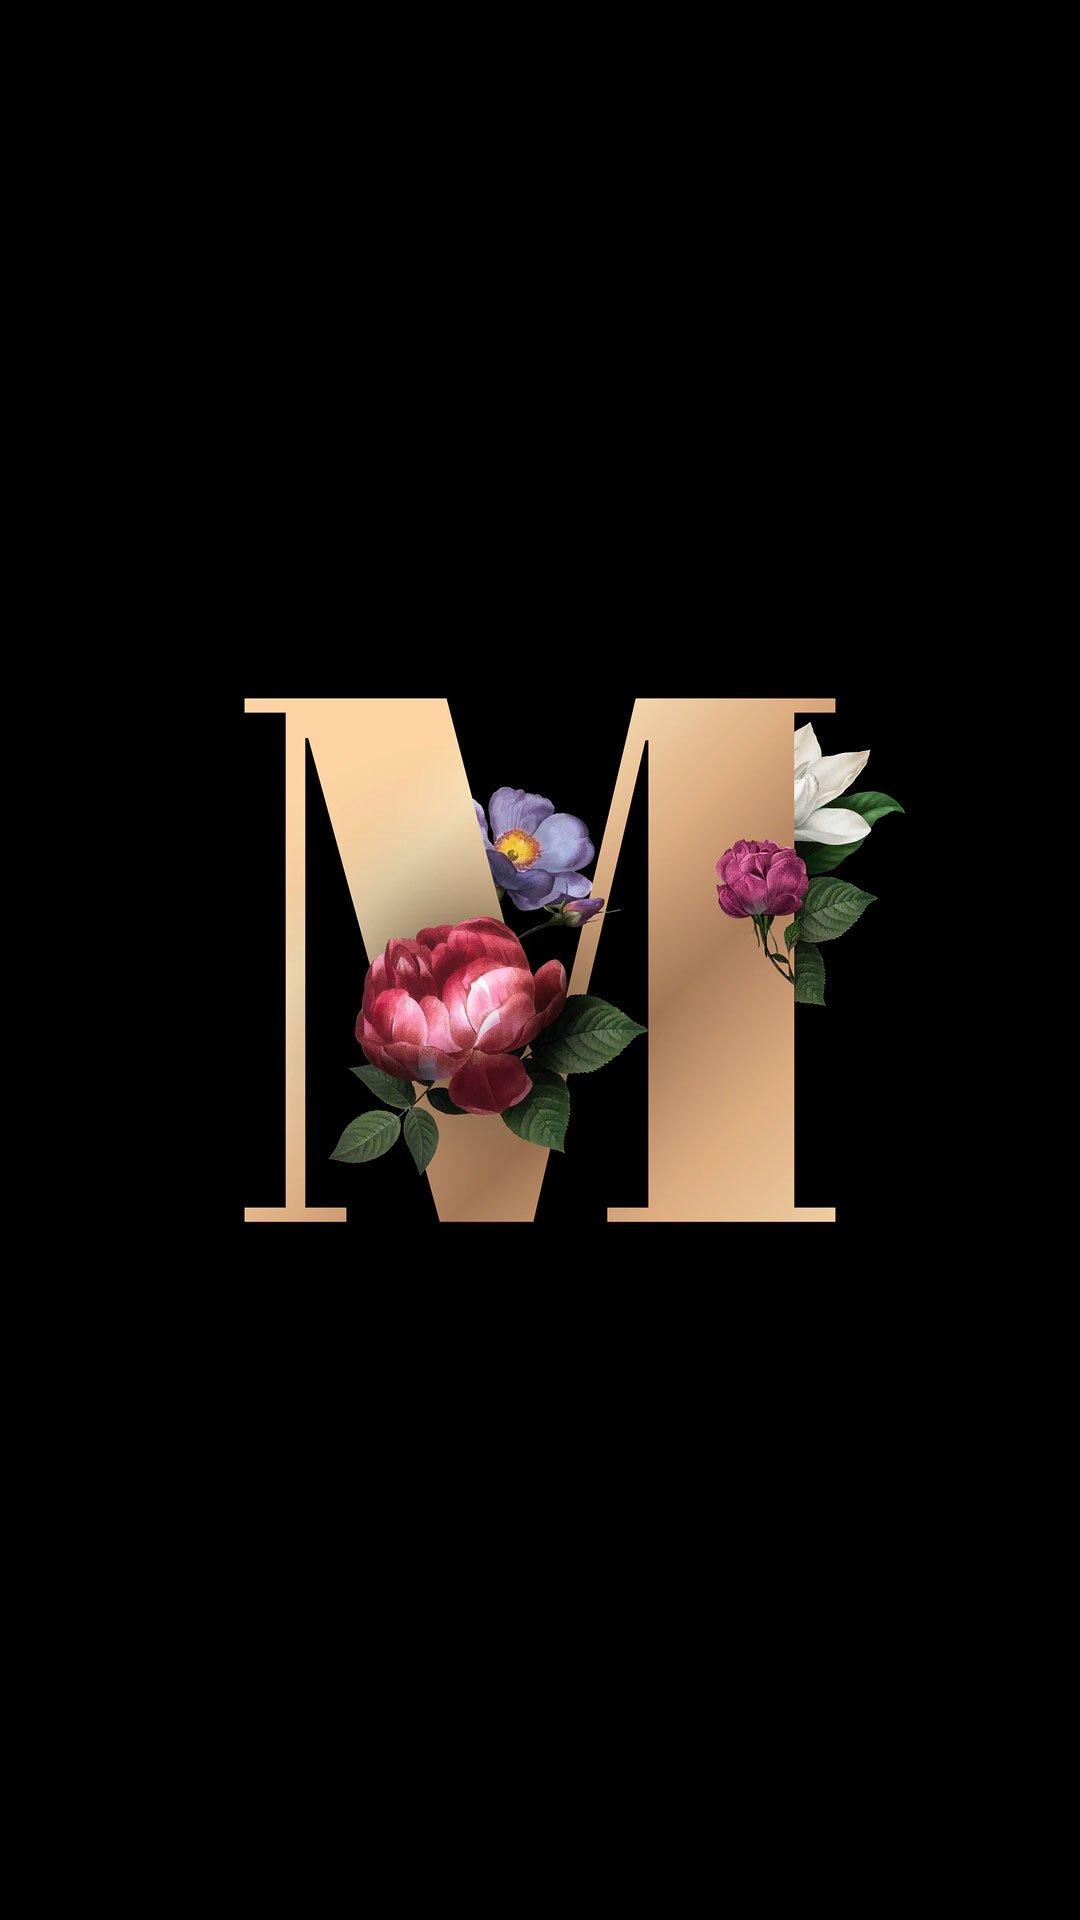 خلفيات ايفون حرف M مربع